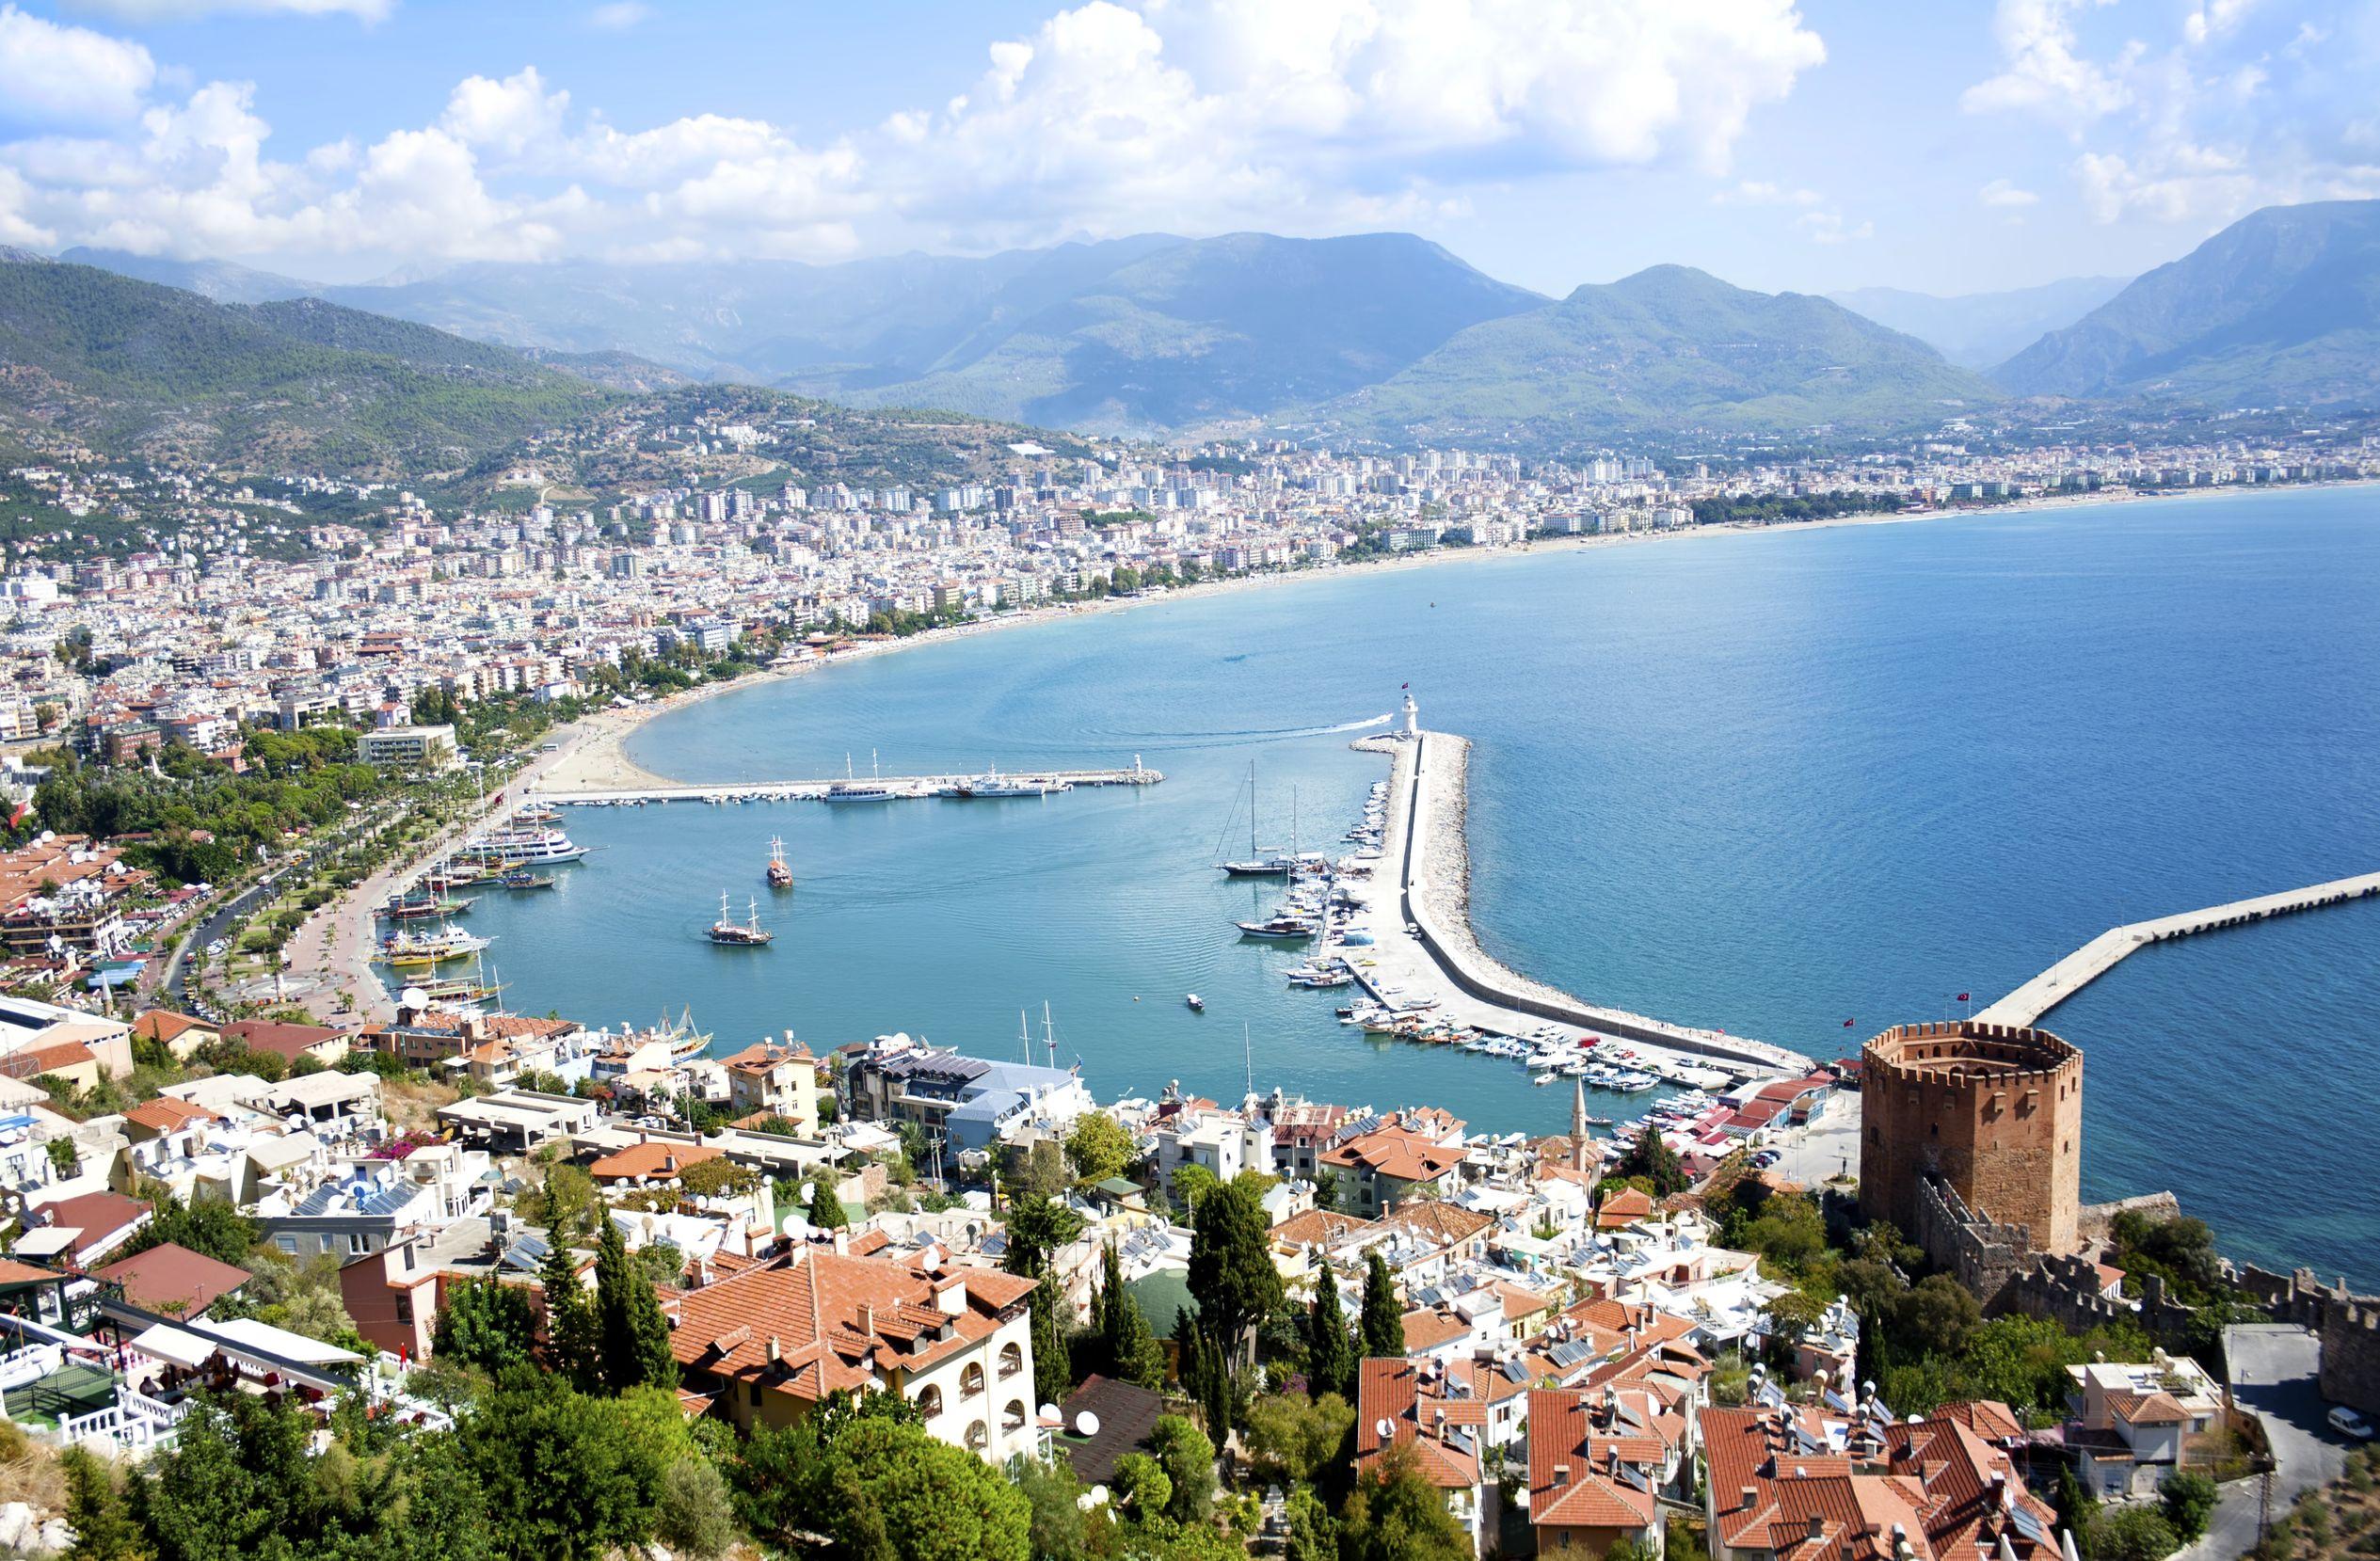 Oferta ne Turqi per Sunshine Hotel 369€ , Hera Park 359€, Katya Hotel  369€